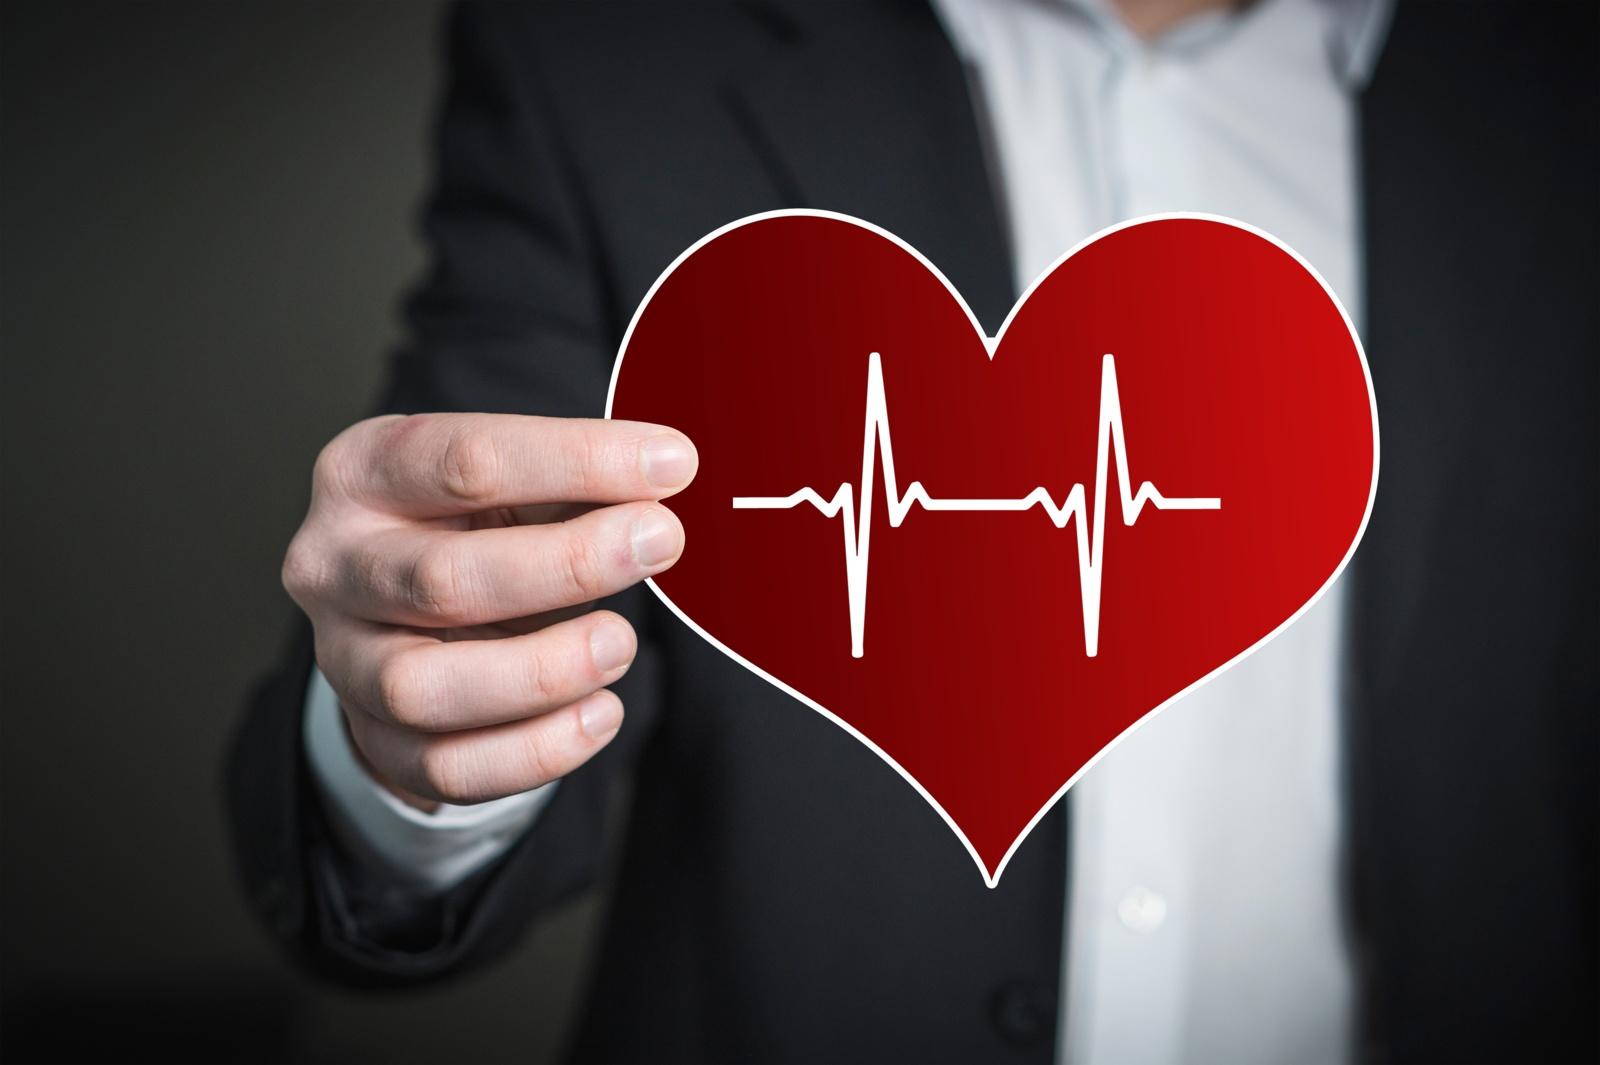 2 hipertenzija 3 rizikos gydymas